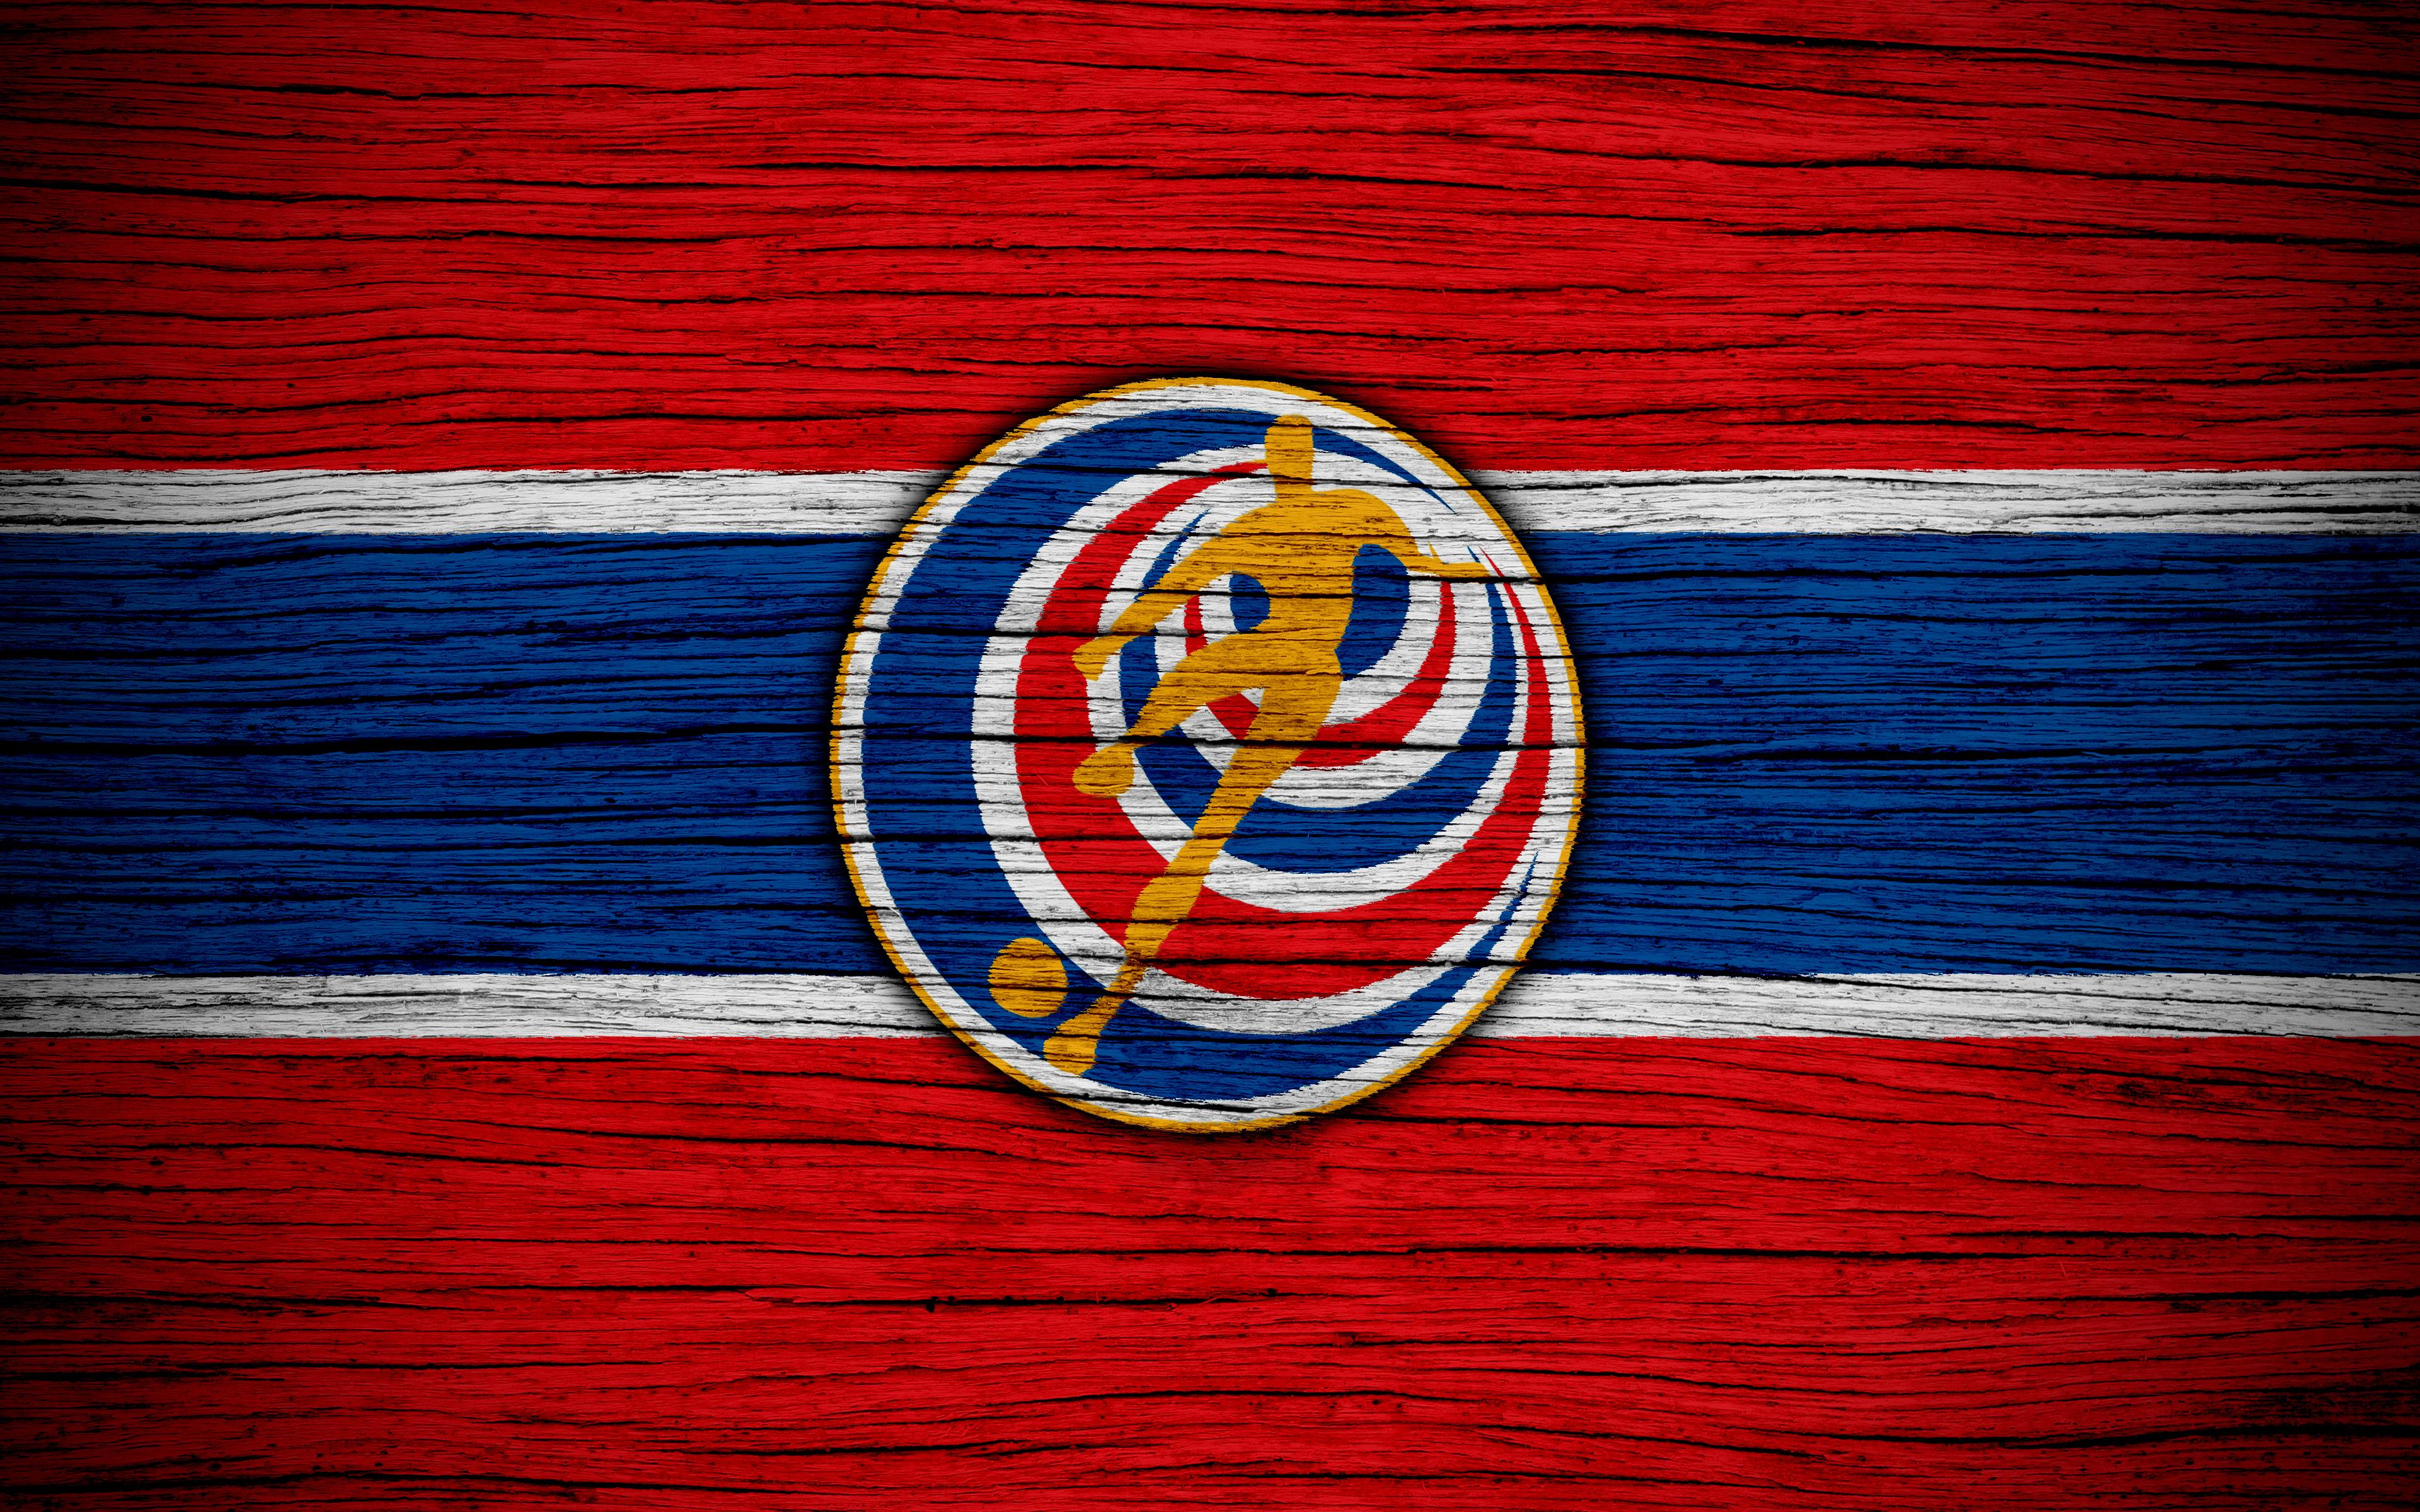 Costa Rica National Football Team 4k Ultra Hd Wallpaper